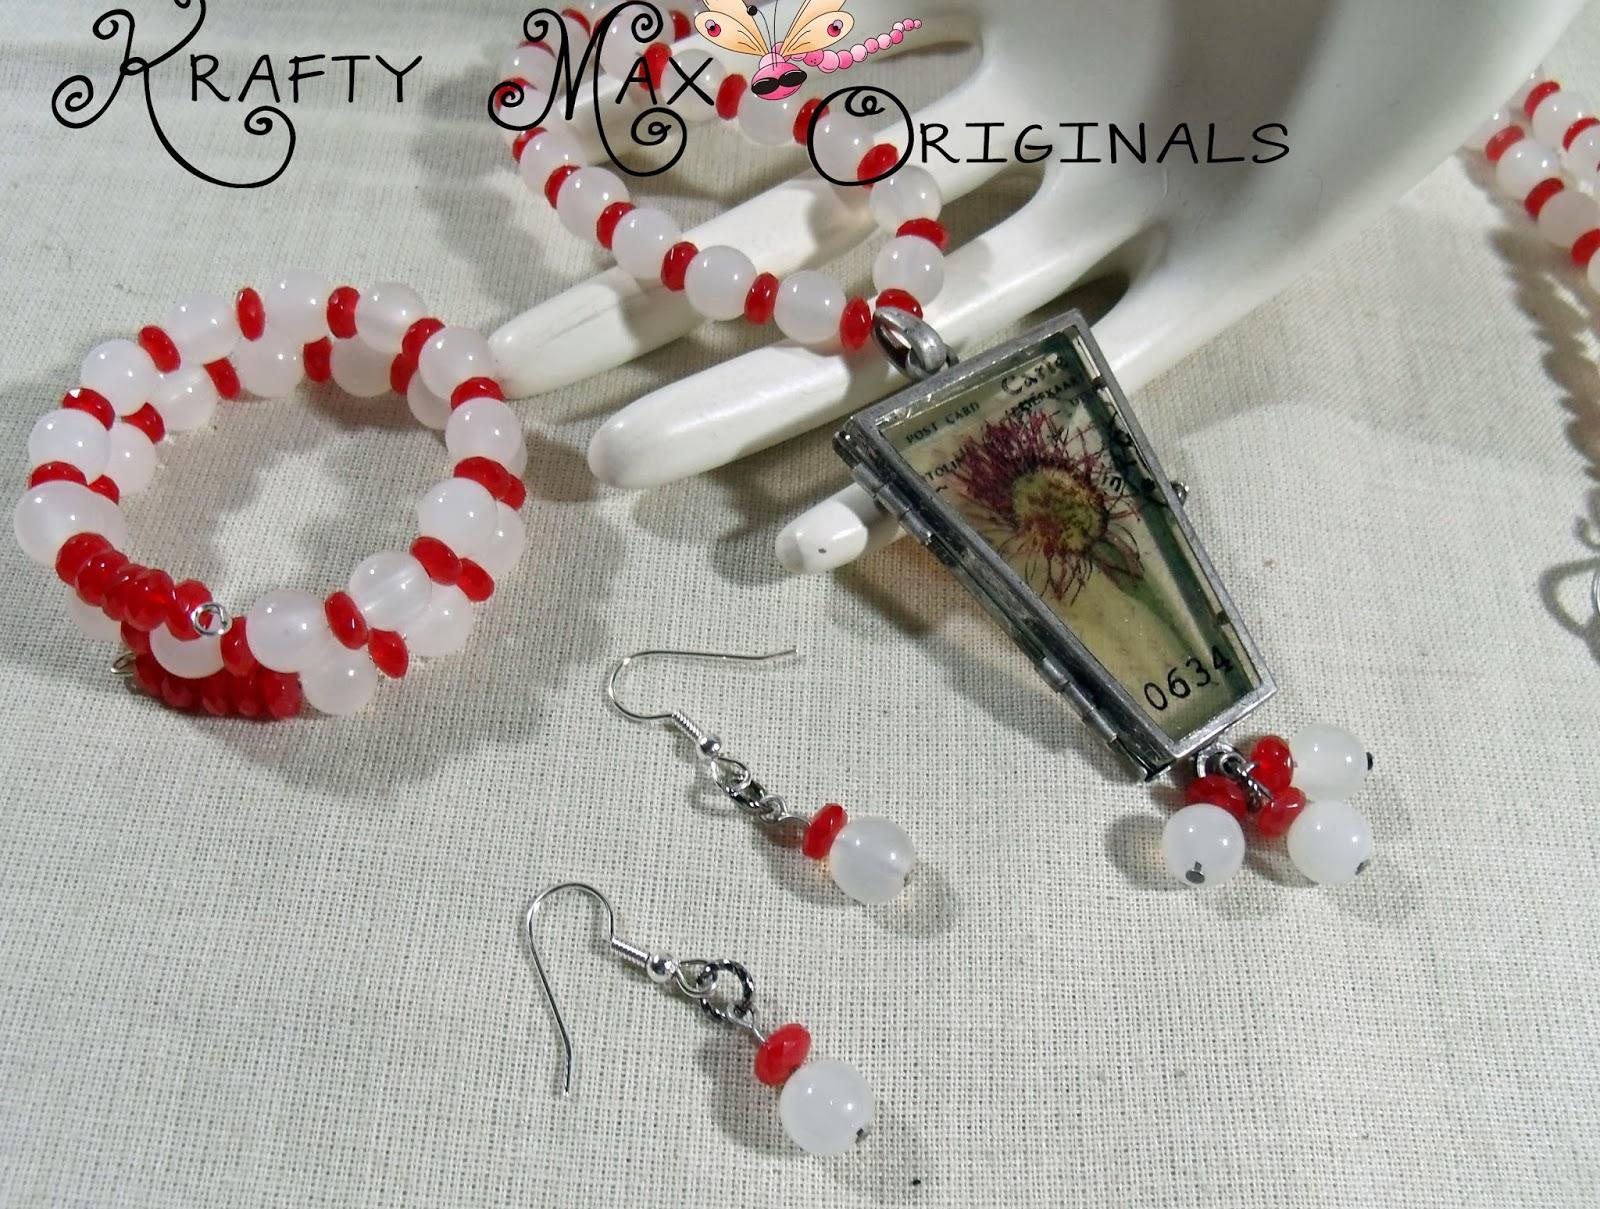 http://www.artfire.com/ext/shop/product_view/8562448#